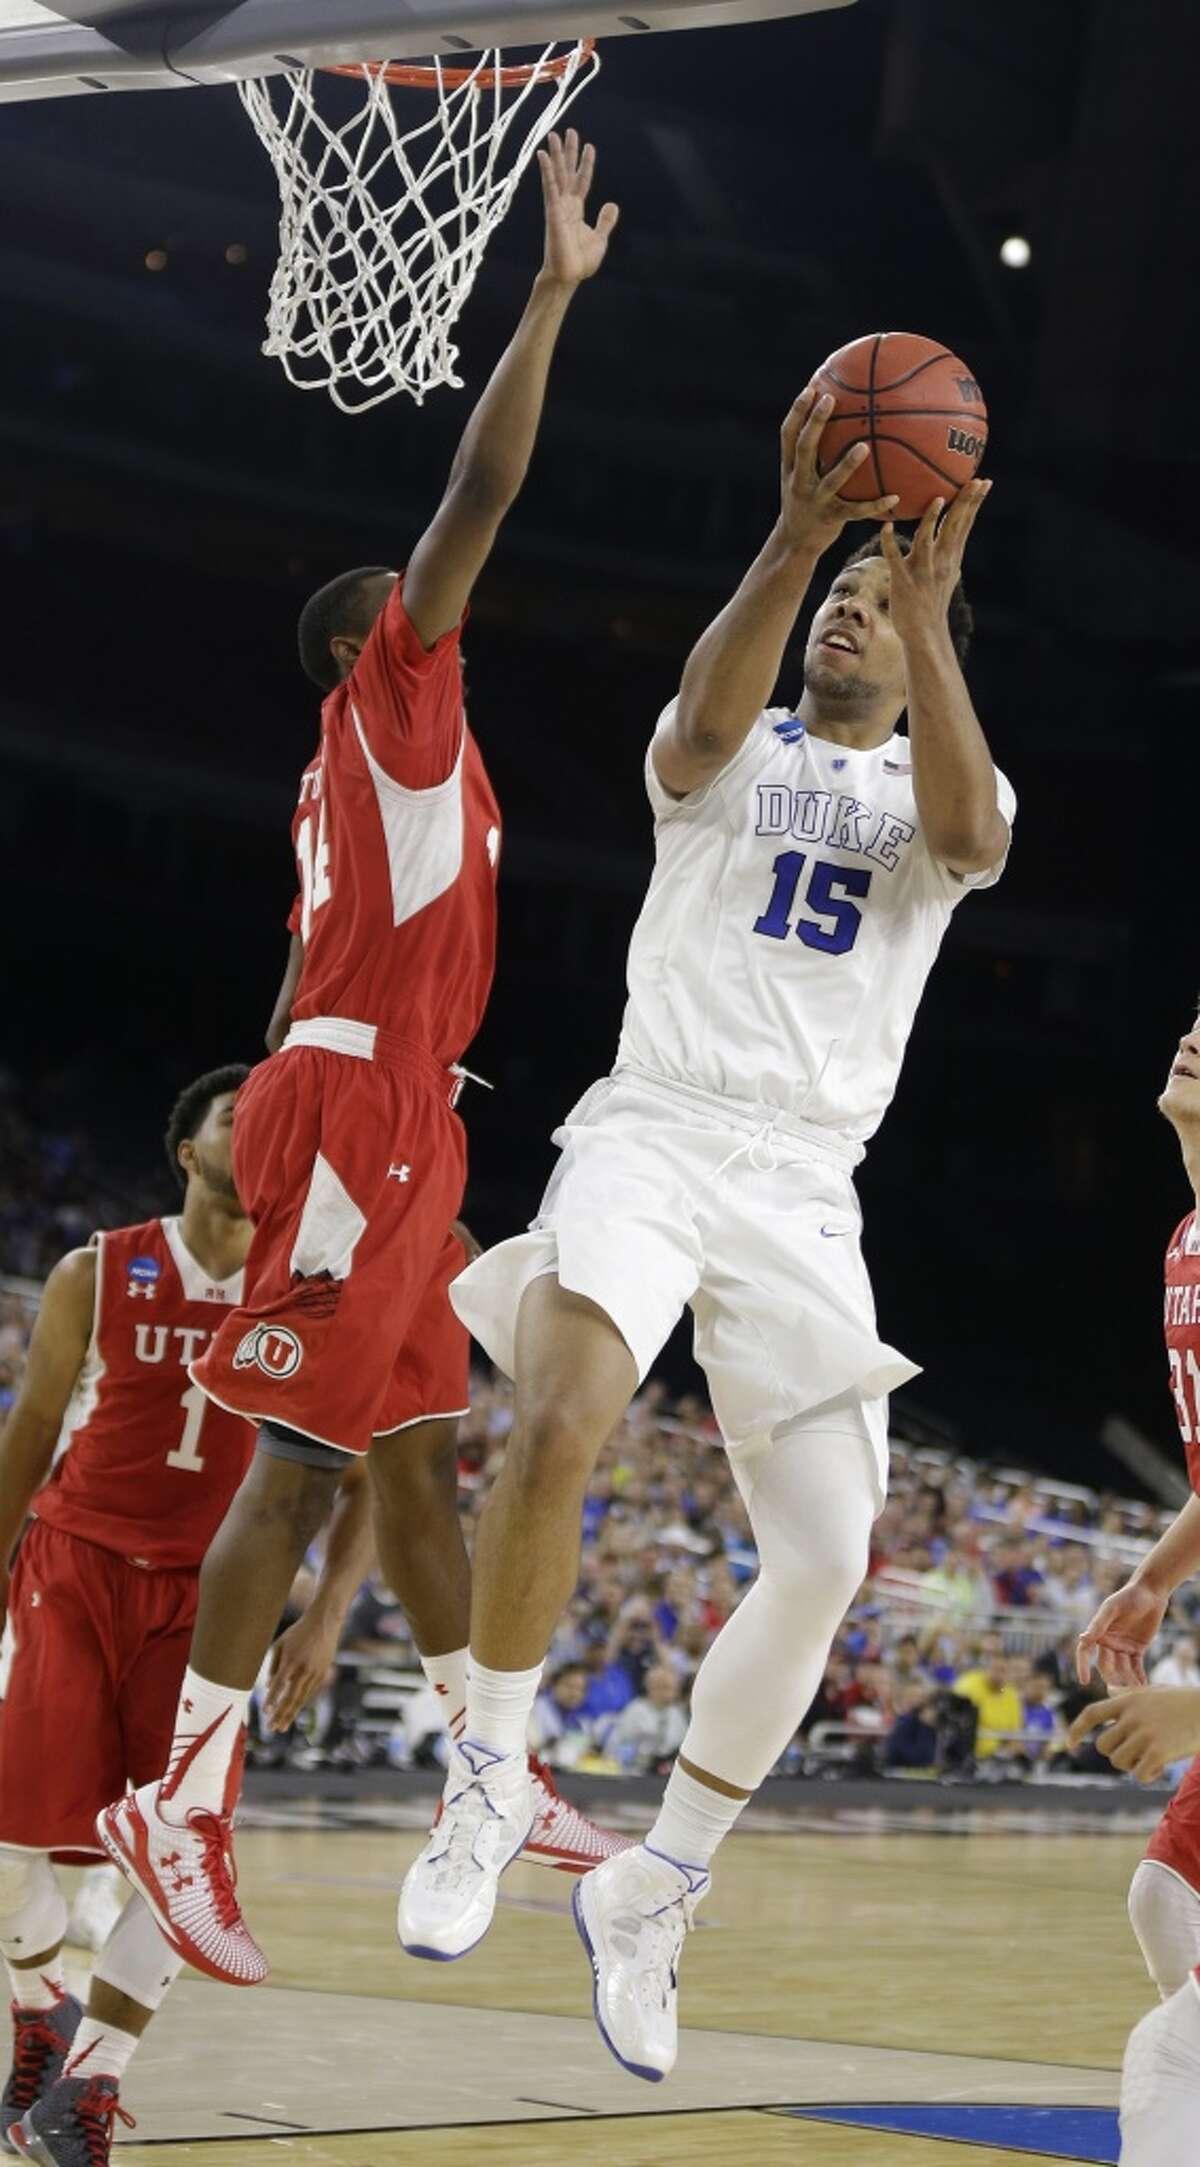 Duke center Jahlil Okafor (15) shoots against Utah guard/forward Dakarai Tucker (14) during the first half of the NCAA South Regional semifinal at NRG Stadium on Friday, March 27, 2015, in Houston. ( Brett Coomer / Houston Chronicle )